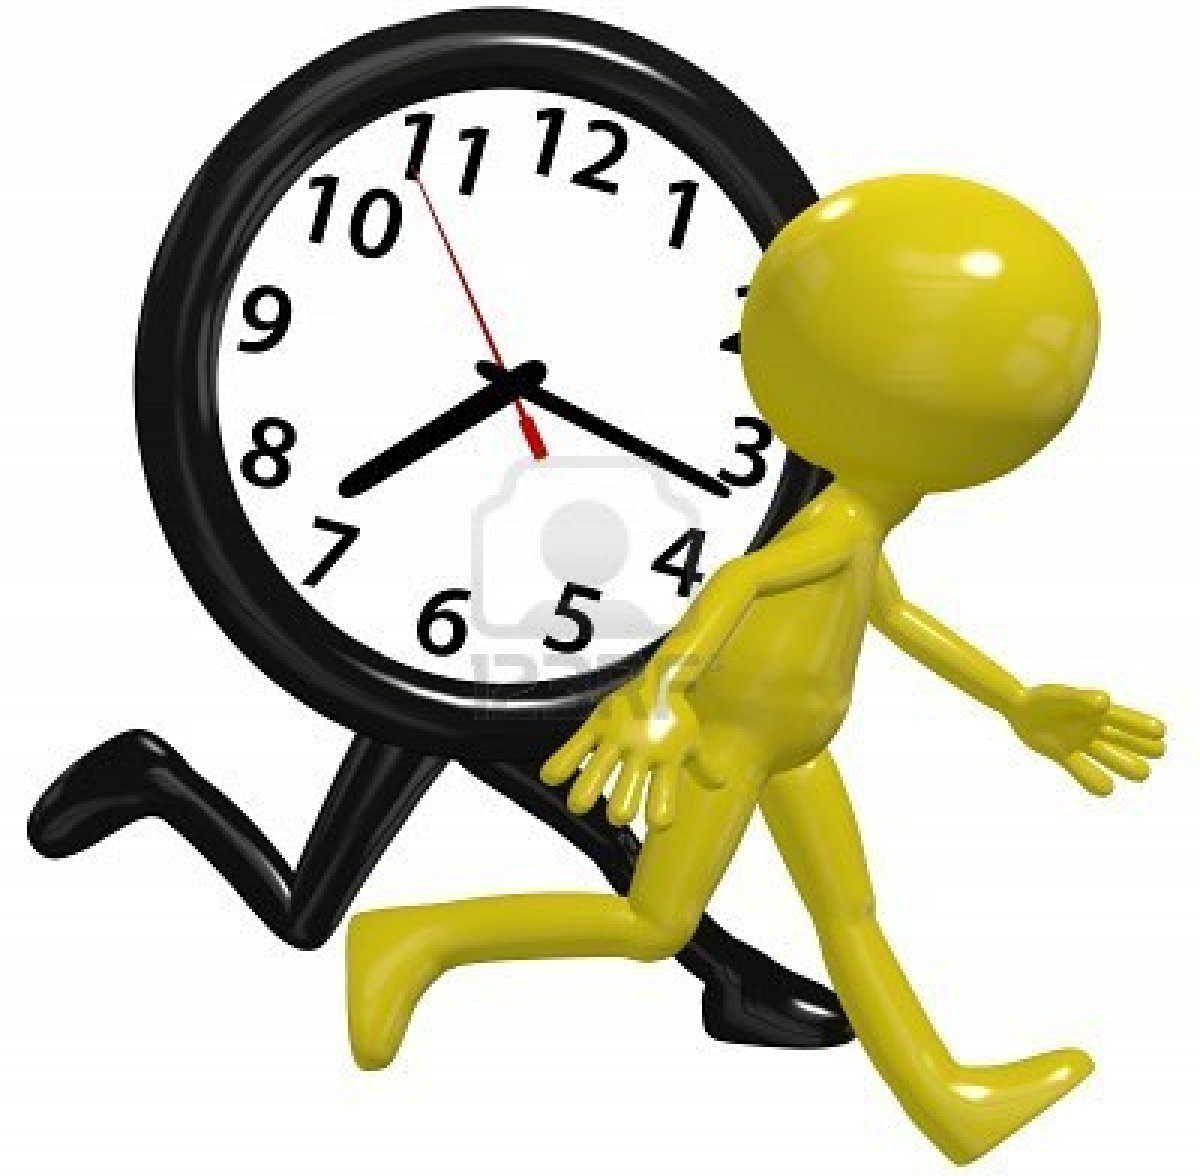 http://4.bp.blogspot.com/-DseD0EMP0kA/TsPoVt98jxI/AAAAAAAADiY/97v-c5Y_xVw/s1600/8434986-a-cartoon-person-runs-a-race-against-a-time-clock-on-a-busy-day.jpg